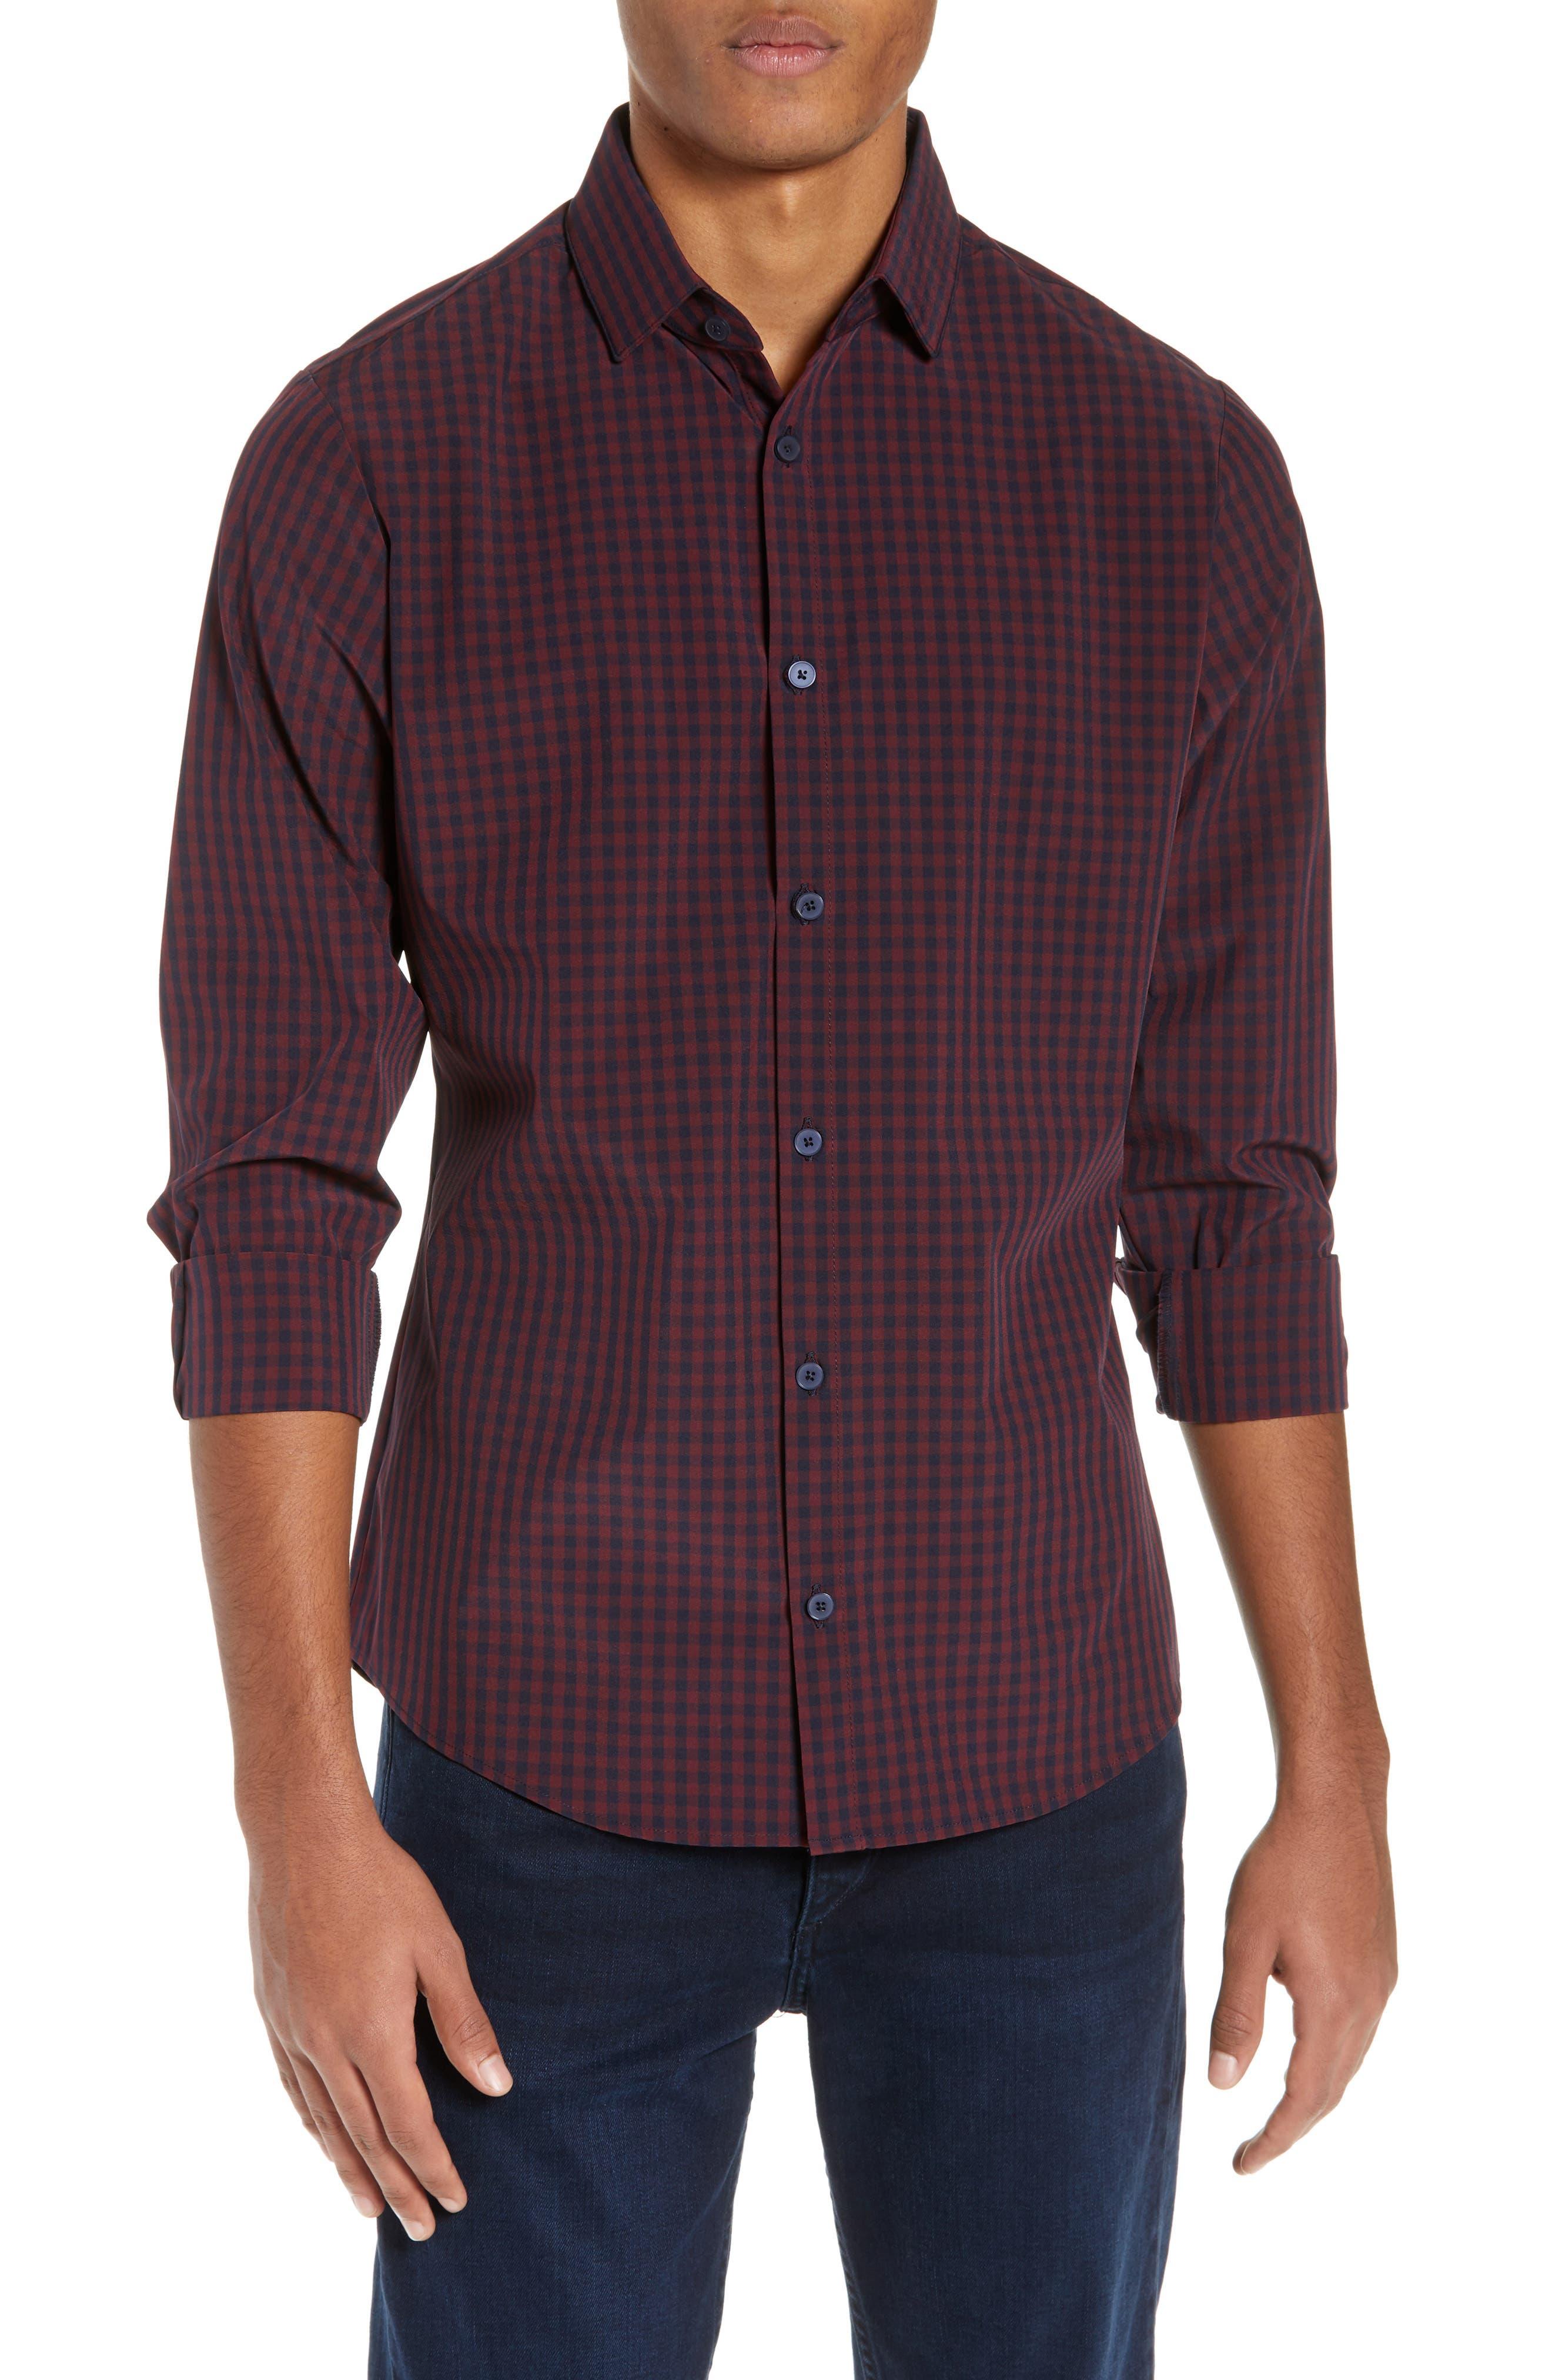 MIZZEN+MAIN, Marshall Check Sport Shirt, Main thumbnail 1, color, 930